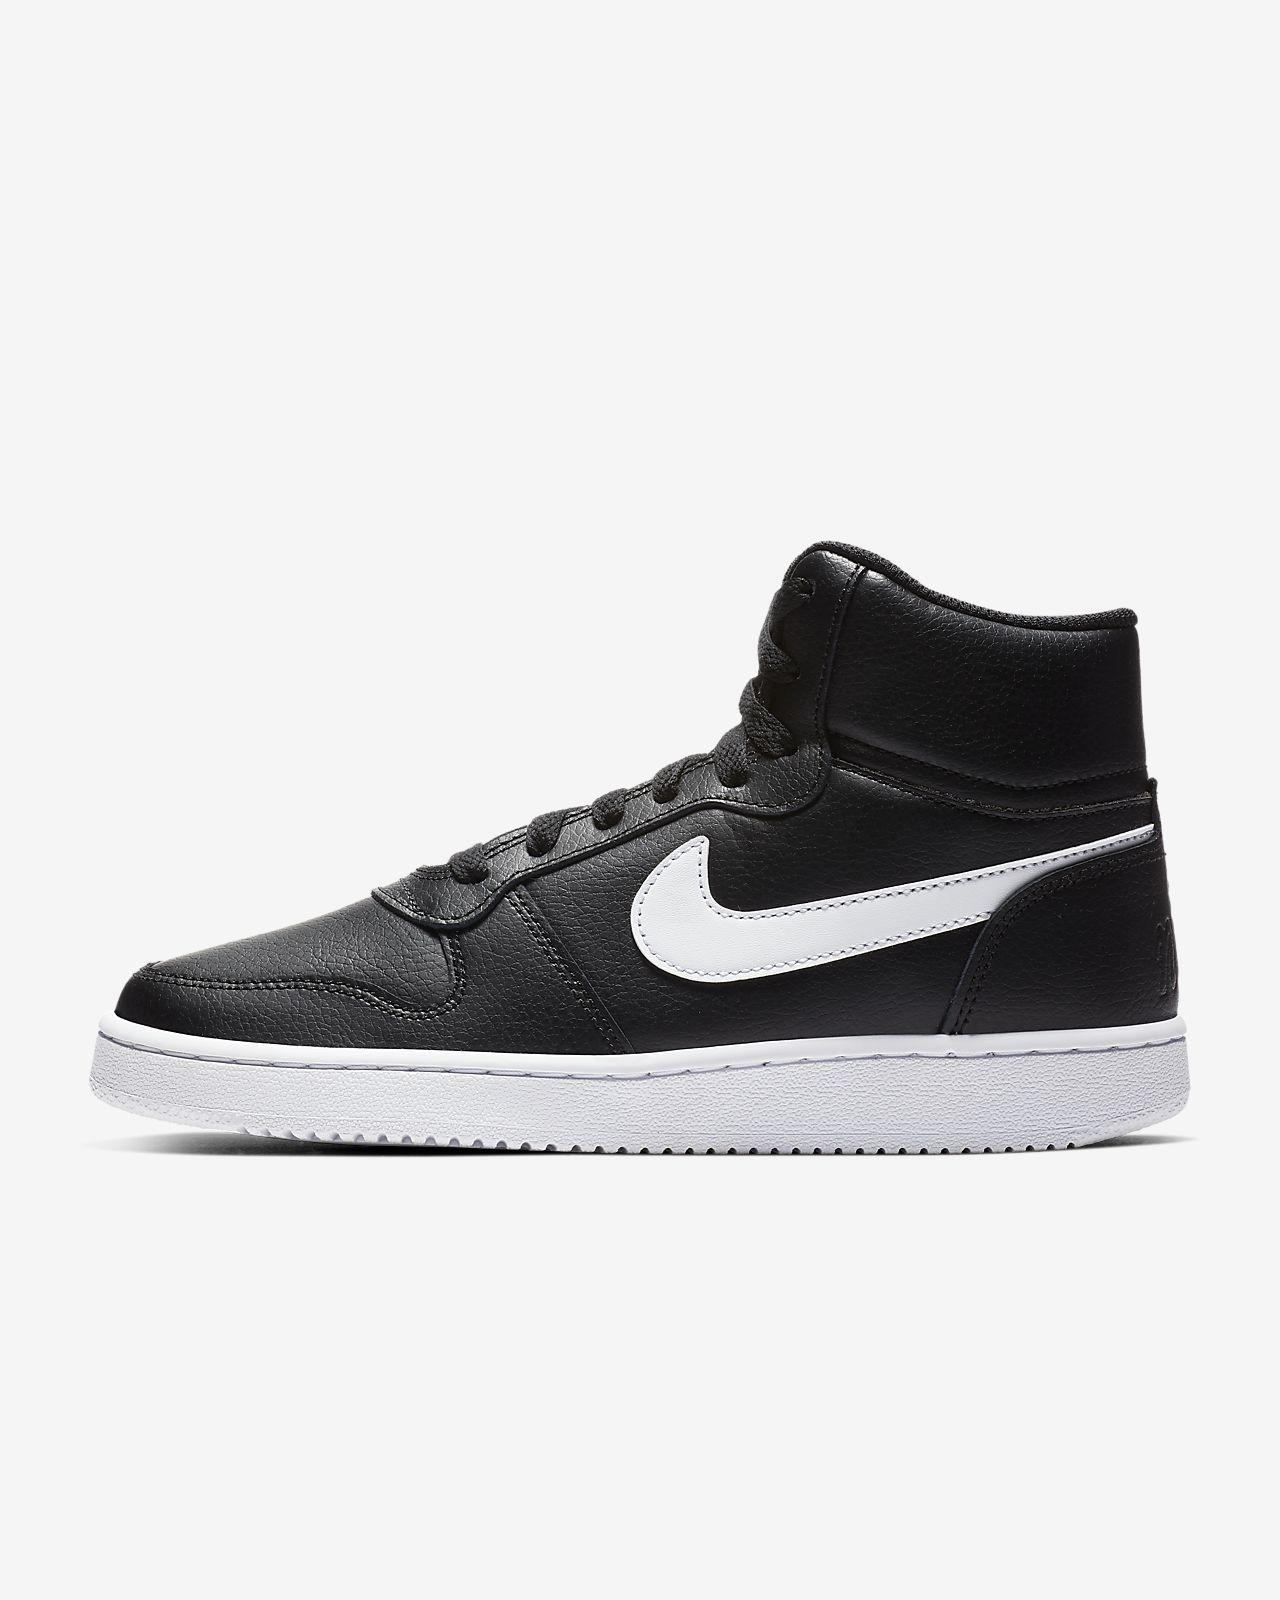 Black//White 001 41 EU Noir Chaussures de Basketball Femme Nike Ebernon Mid